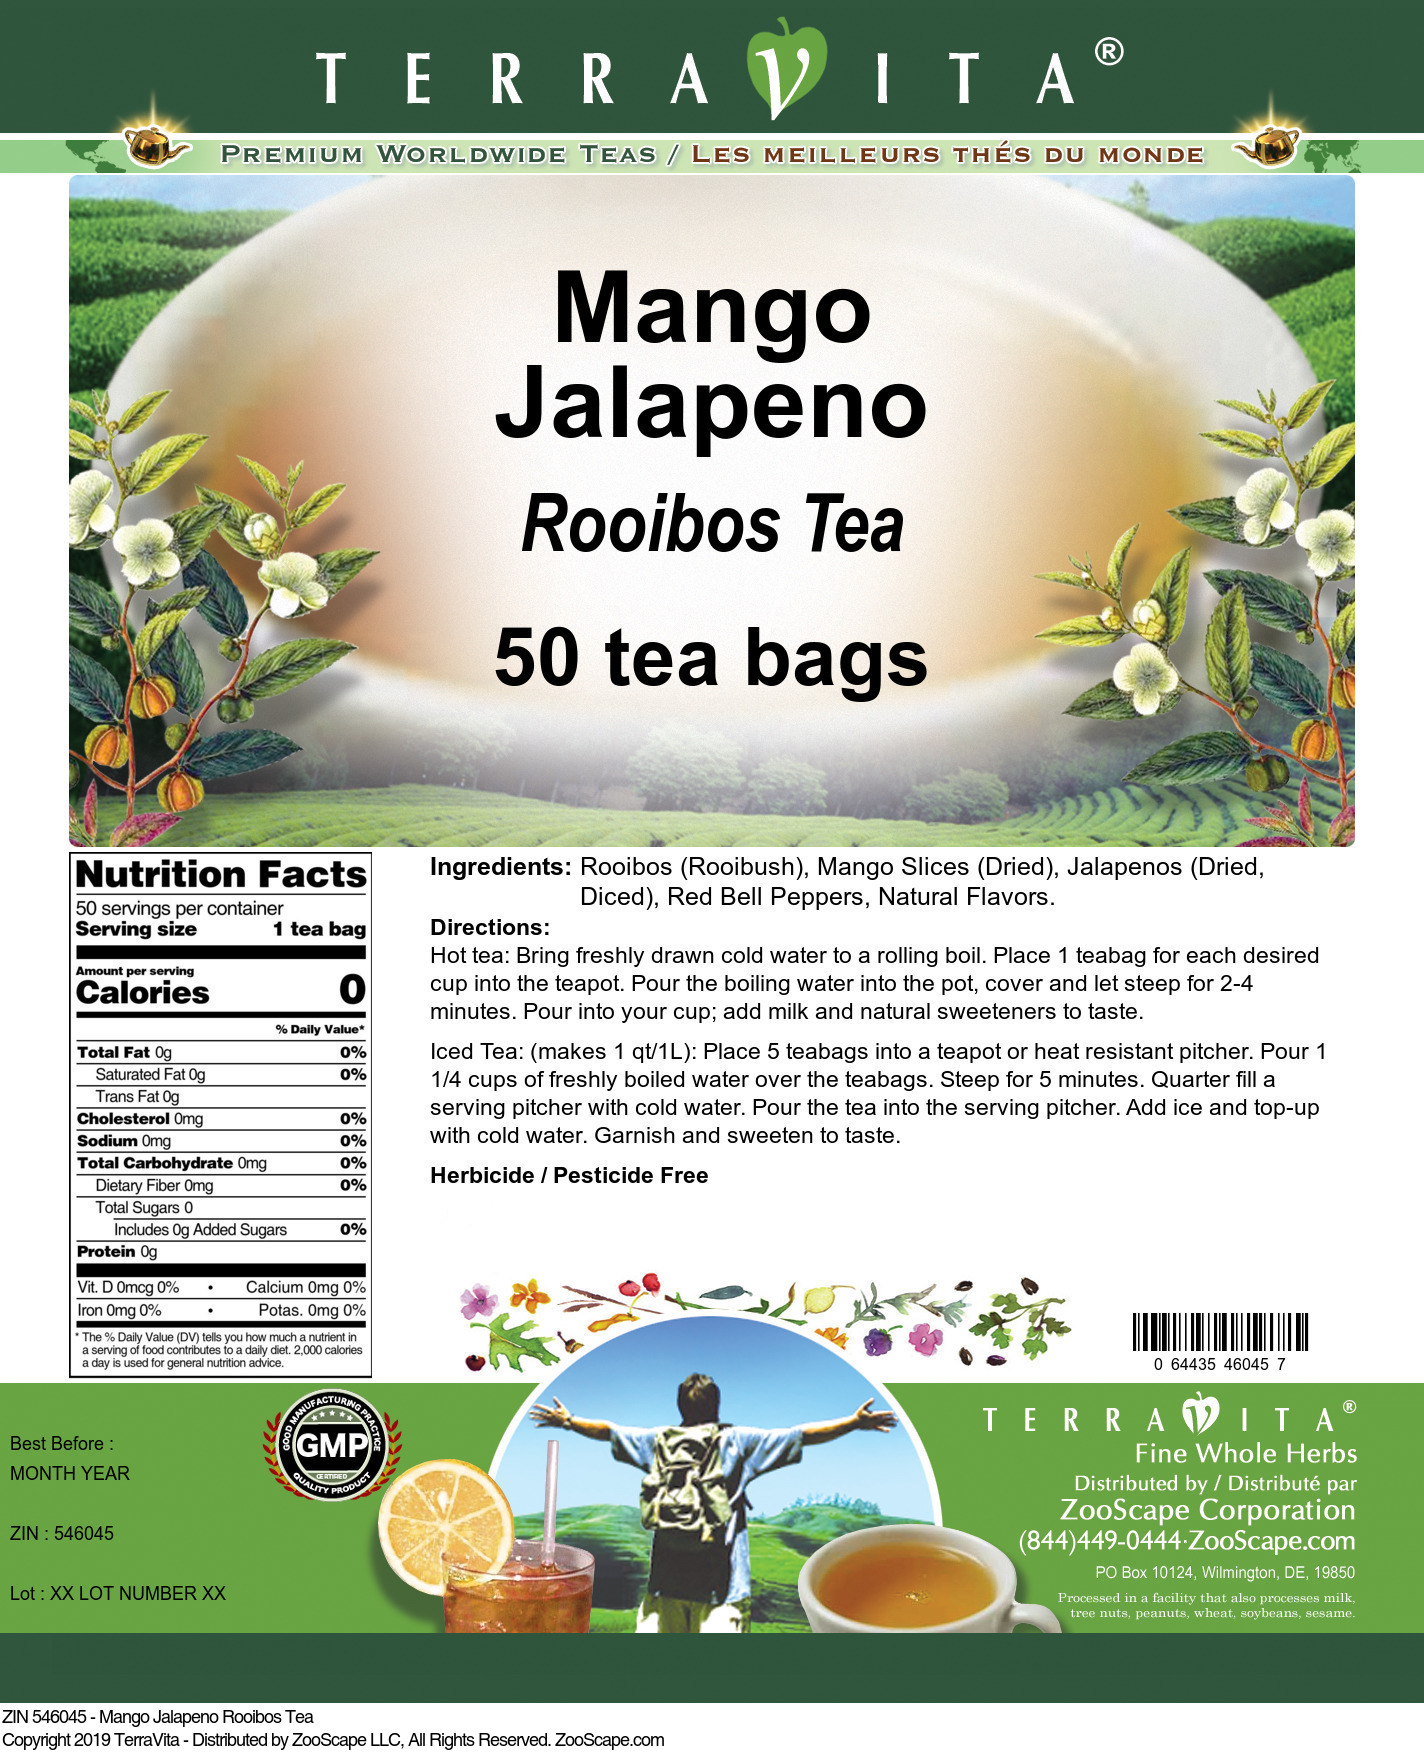 Mango Jalapeno Rooibos Tea